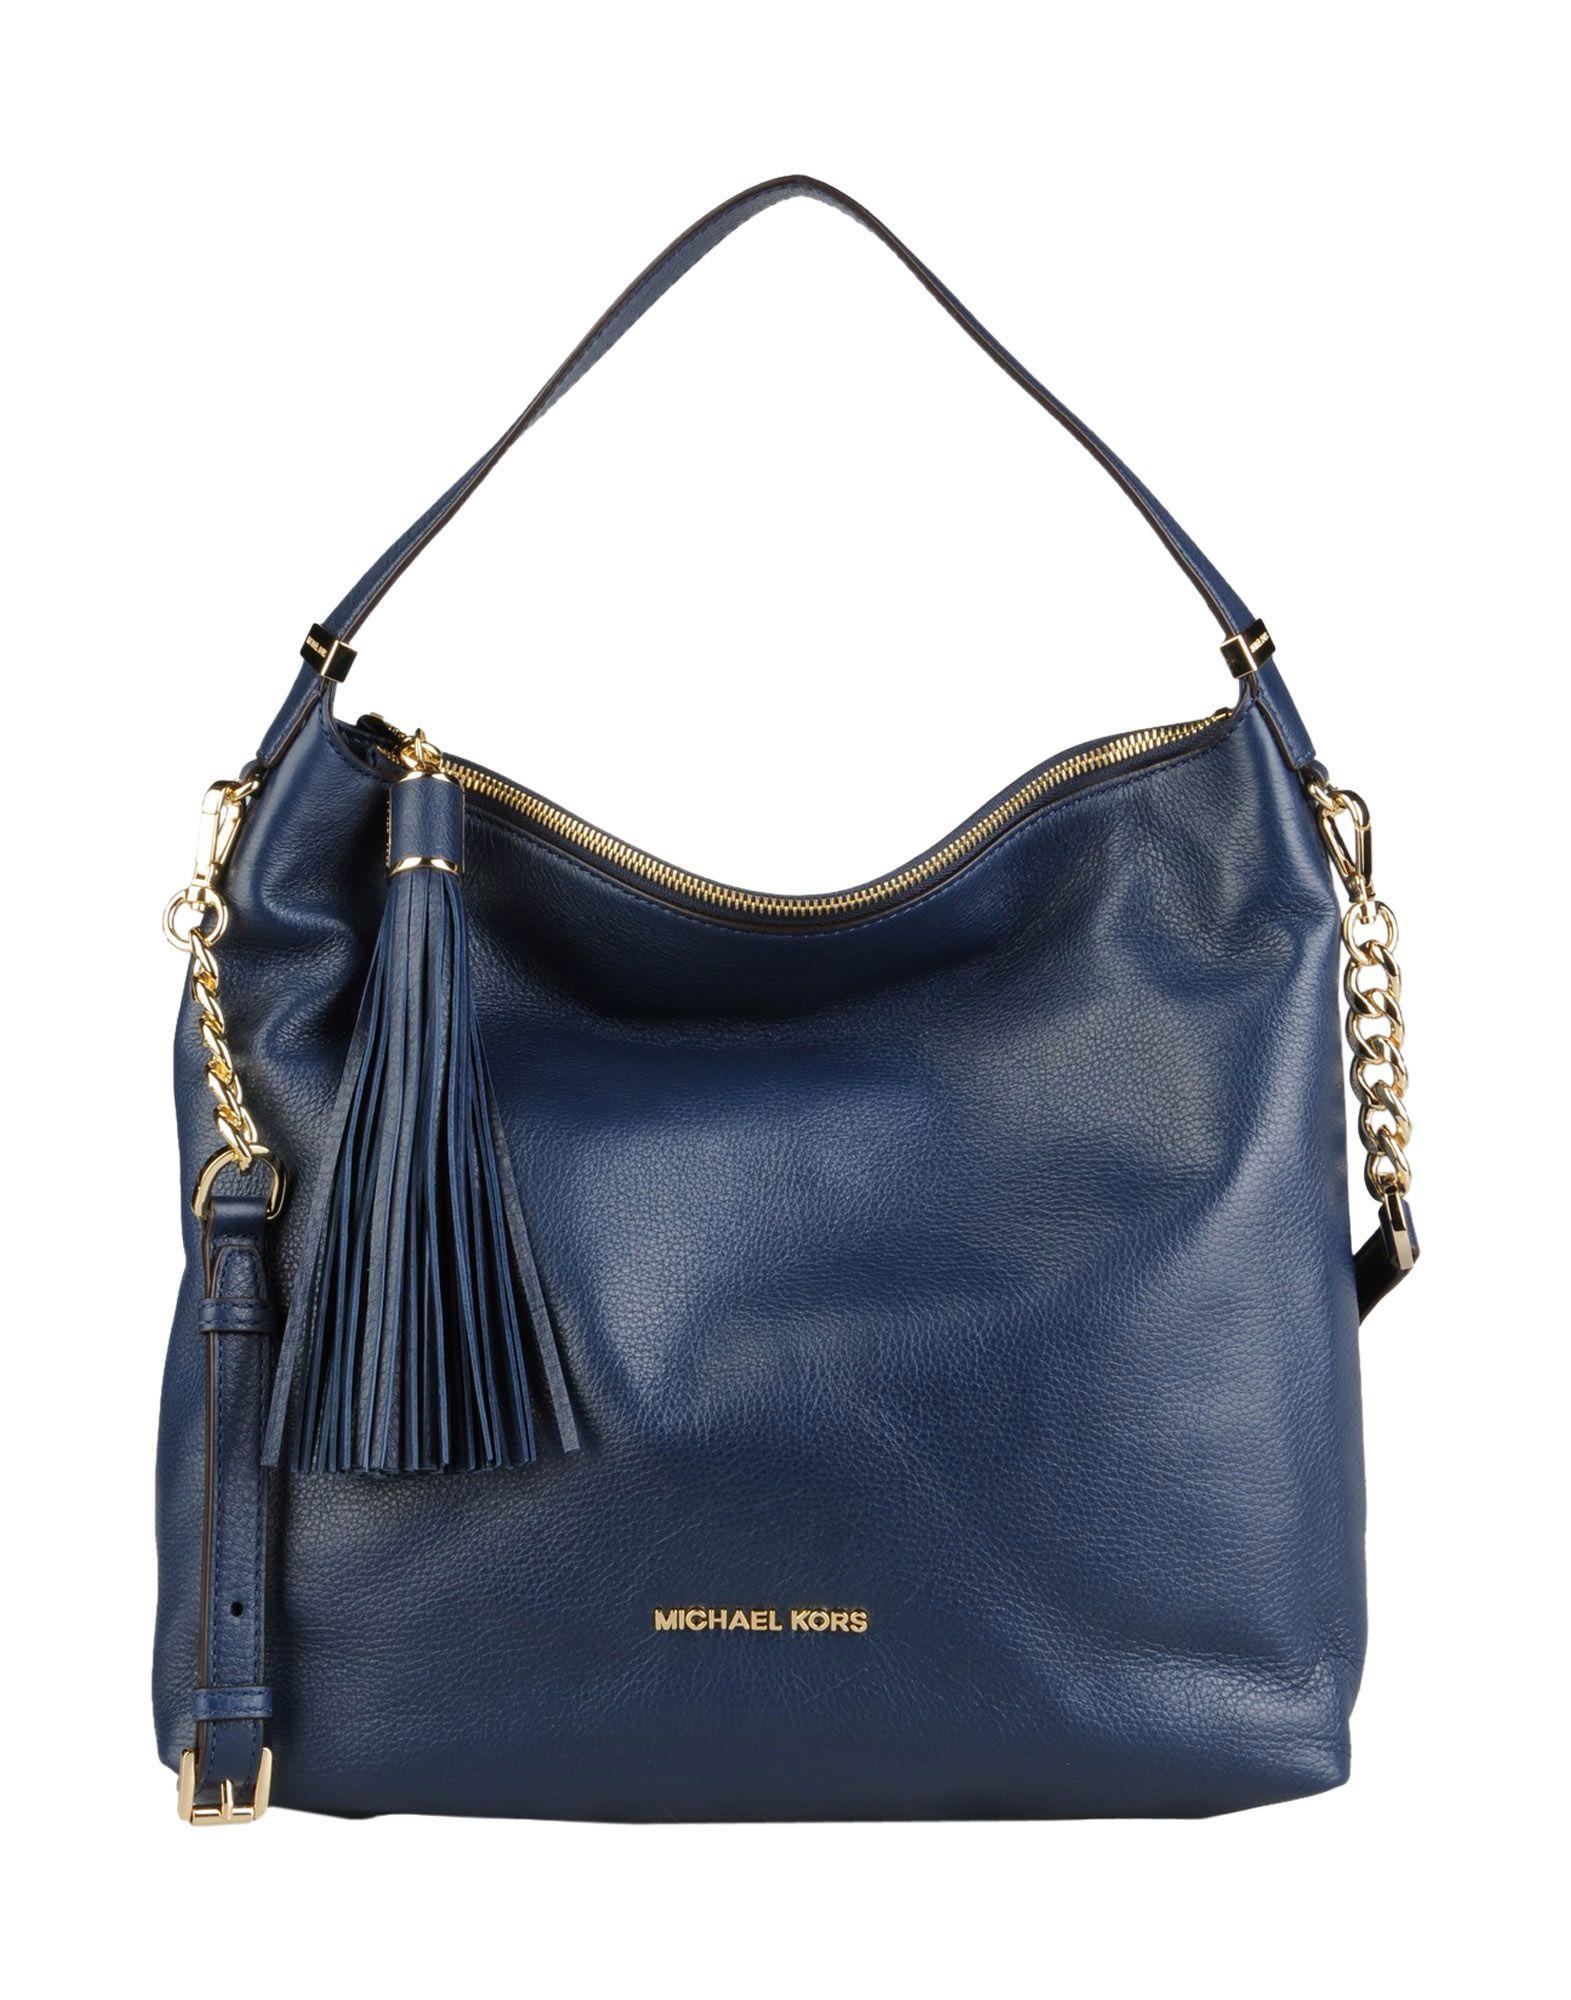 Michael Michael Kors Handbag in Blue